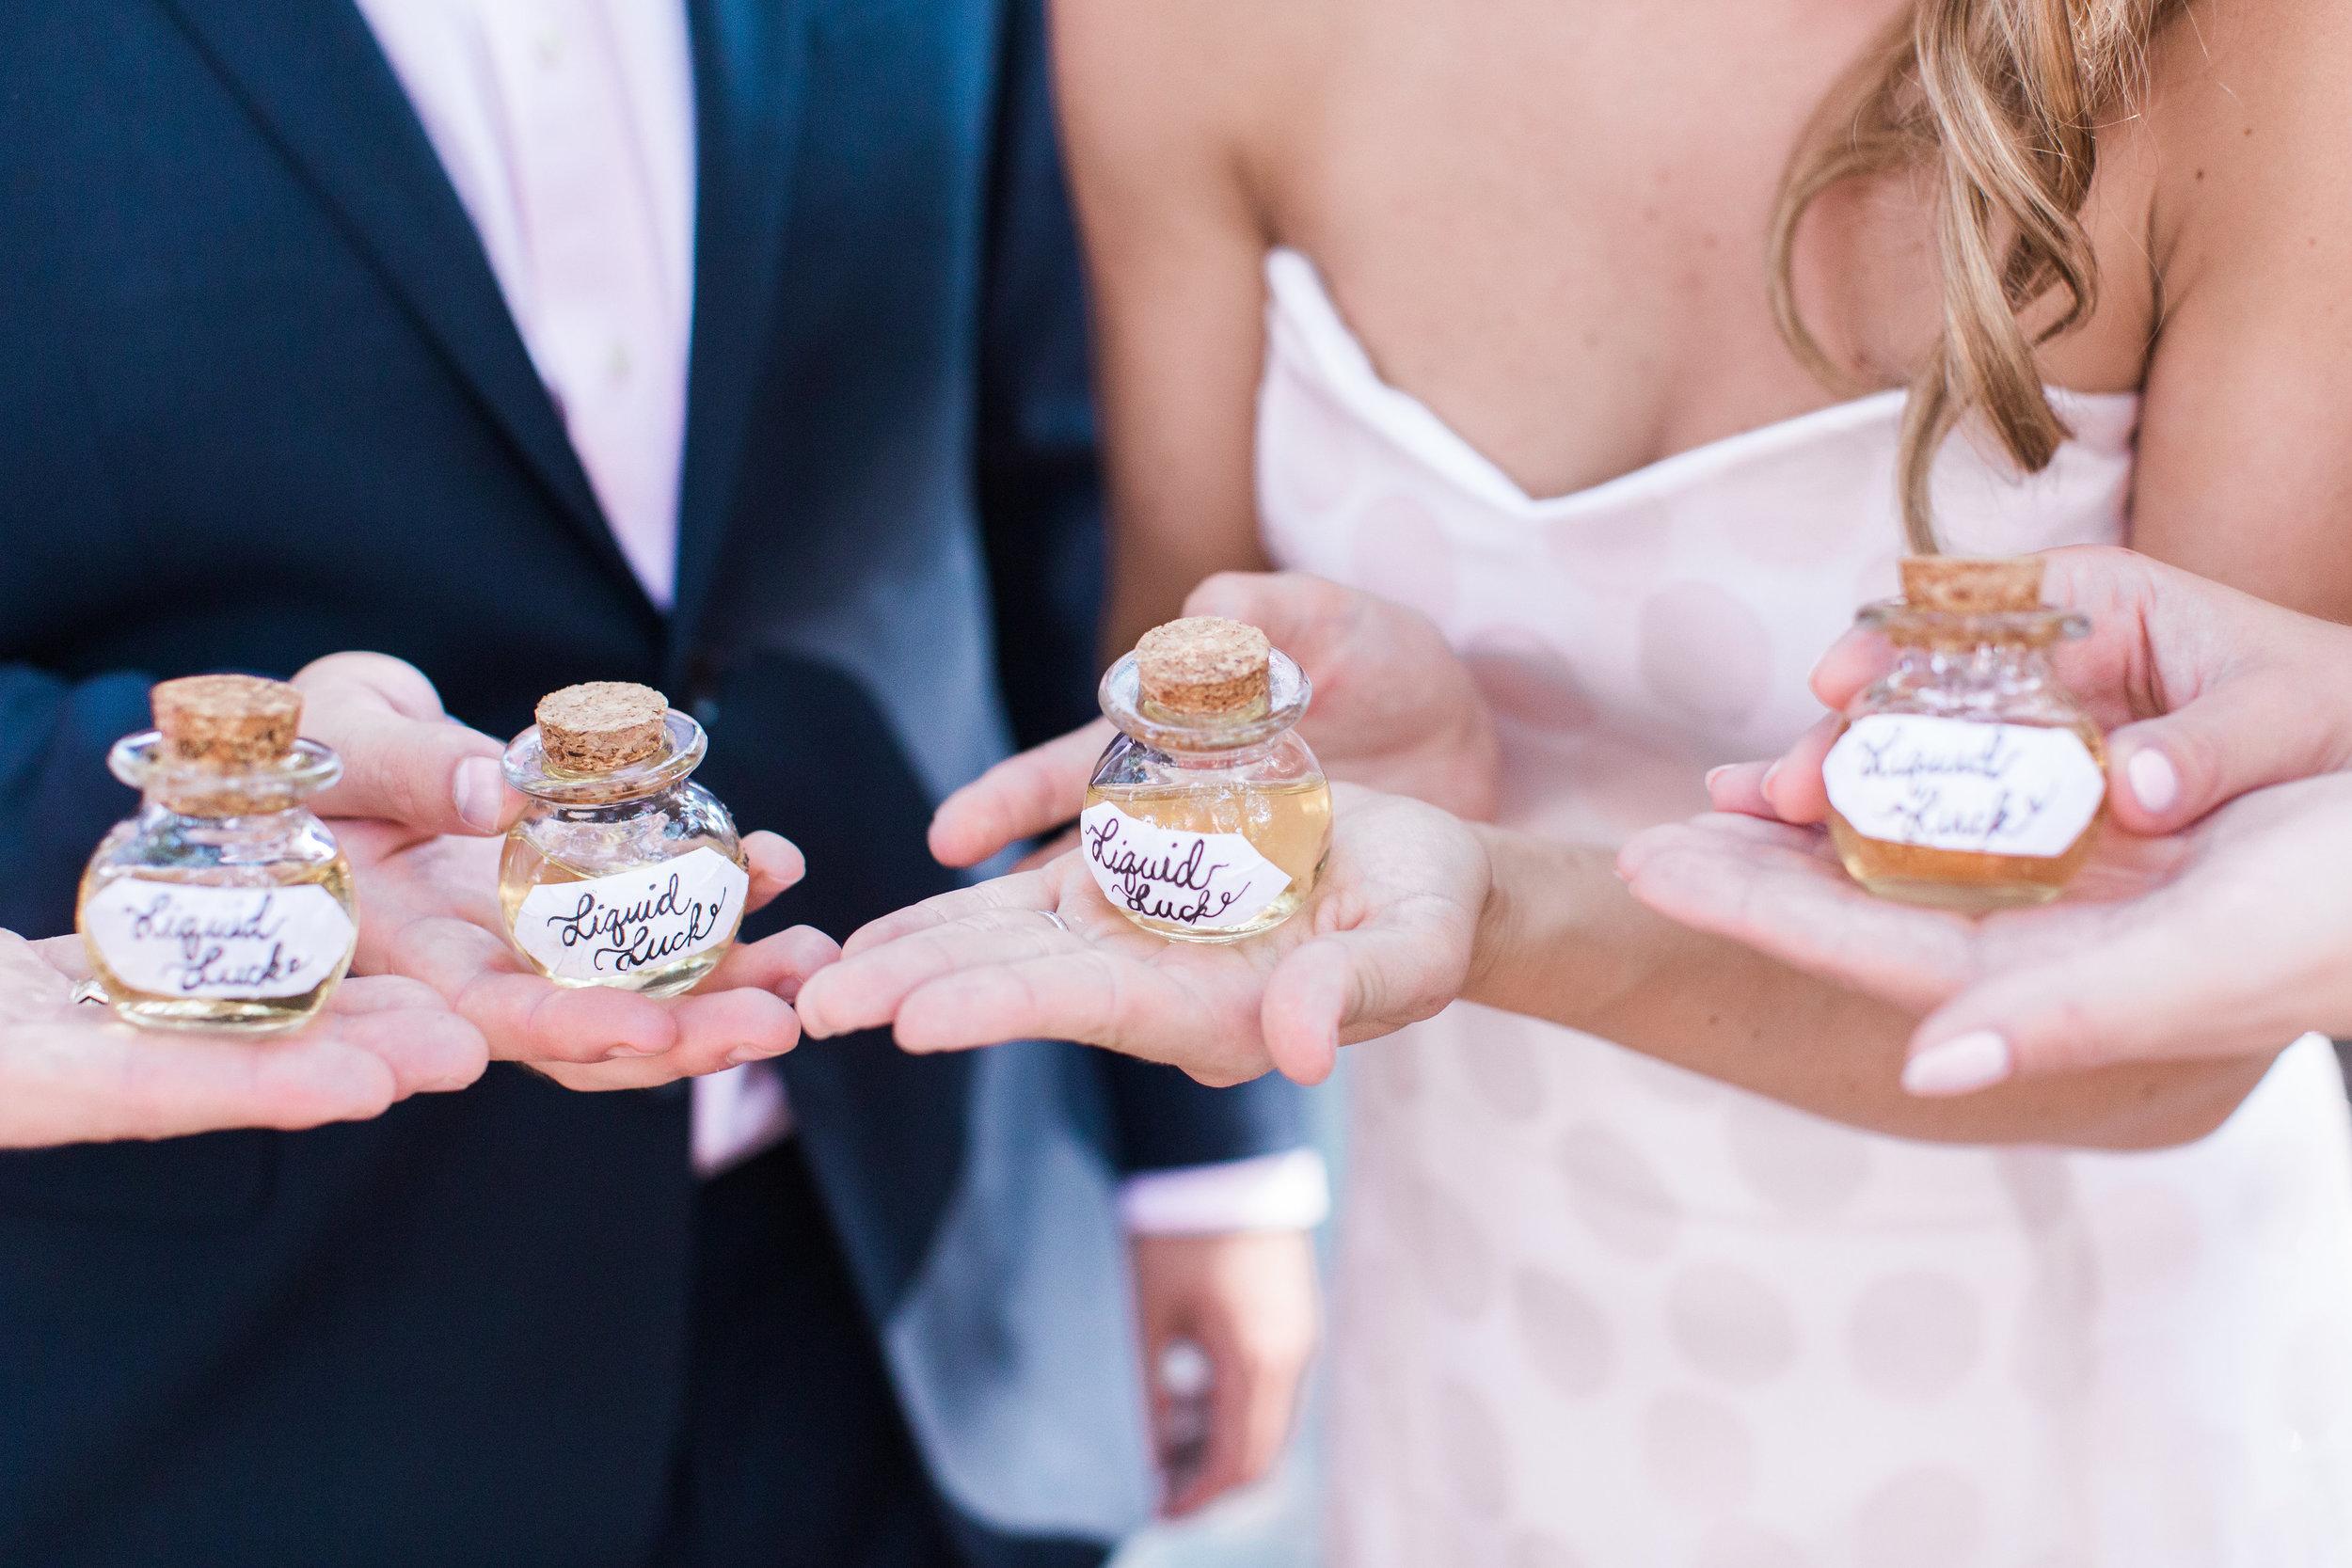 Eve & Patrick's wedding in Savannah GA  //  A Lowcountry Wedding Magazine